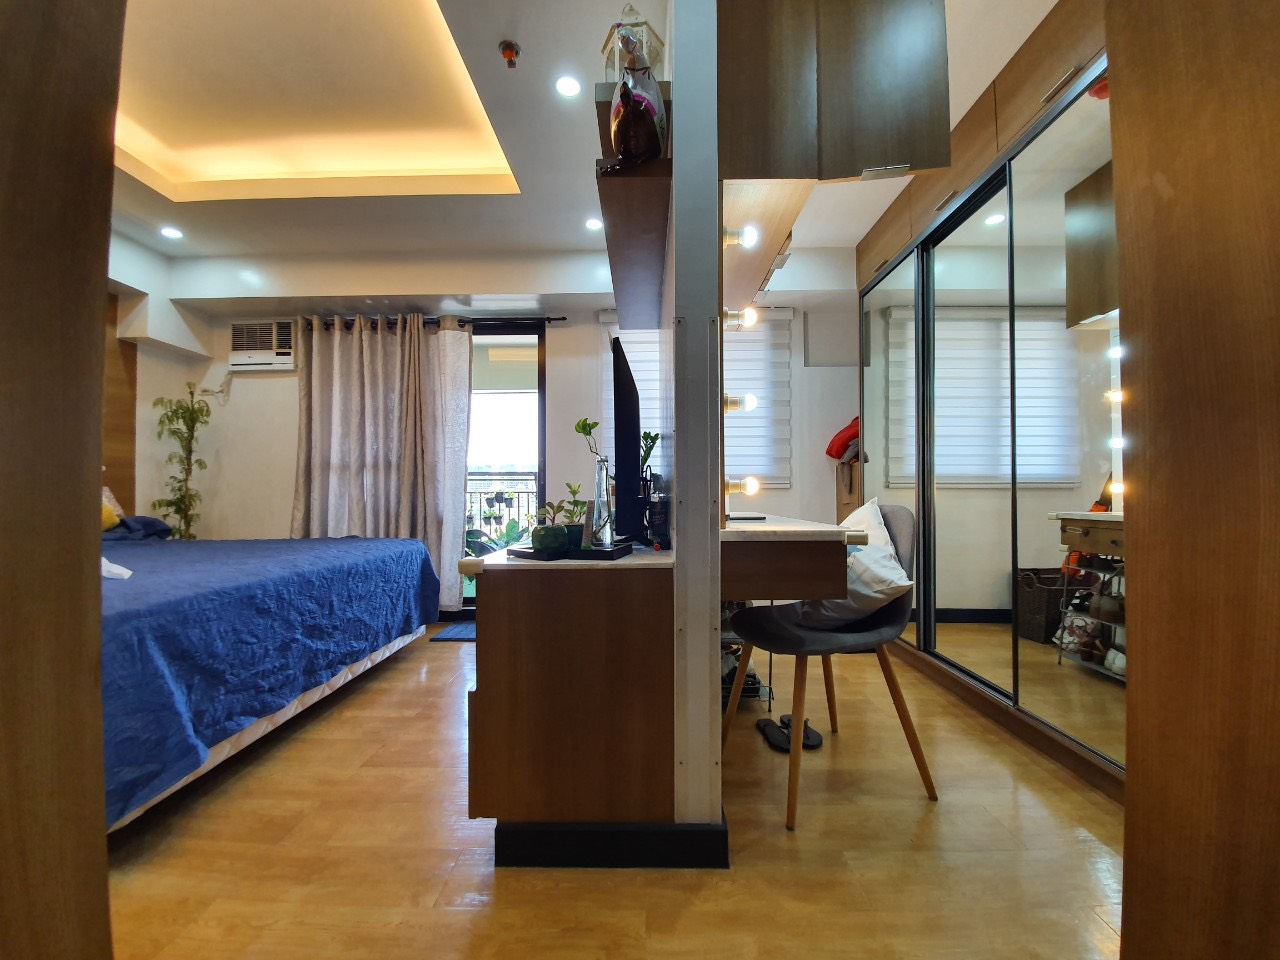 2BR Condo For Sale, Royal Palm Residences, Acacia Estate 4